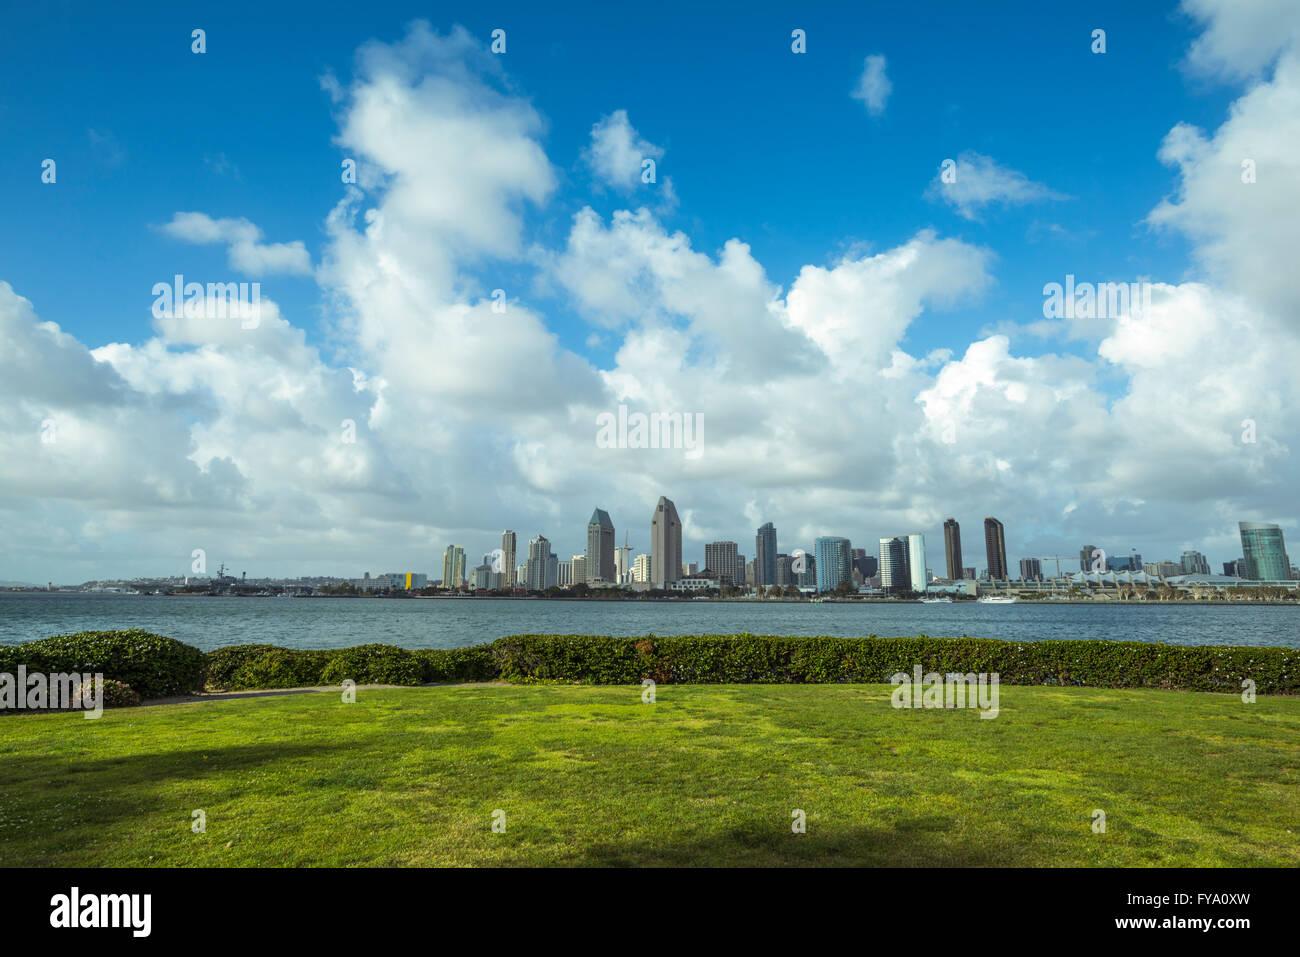 San Diego Harbor and Skyline. View from Coronado, California, USA. Stock Photo